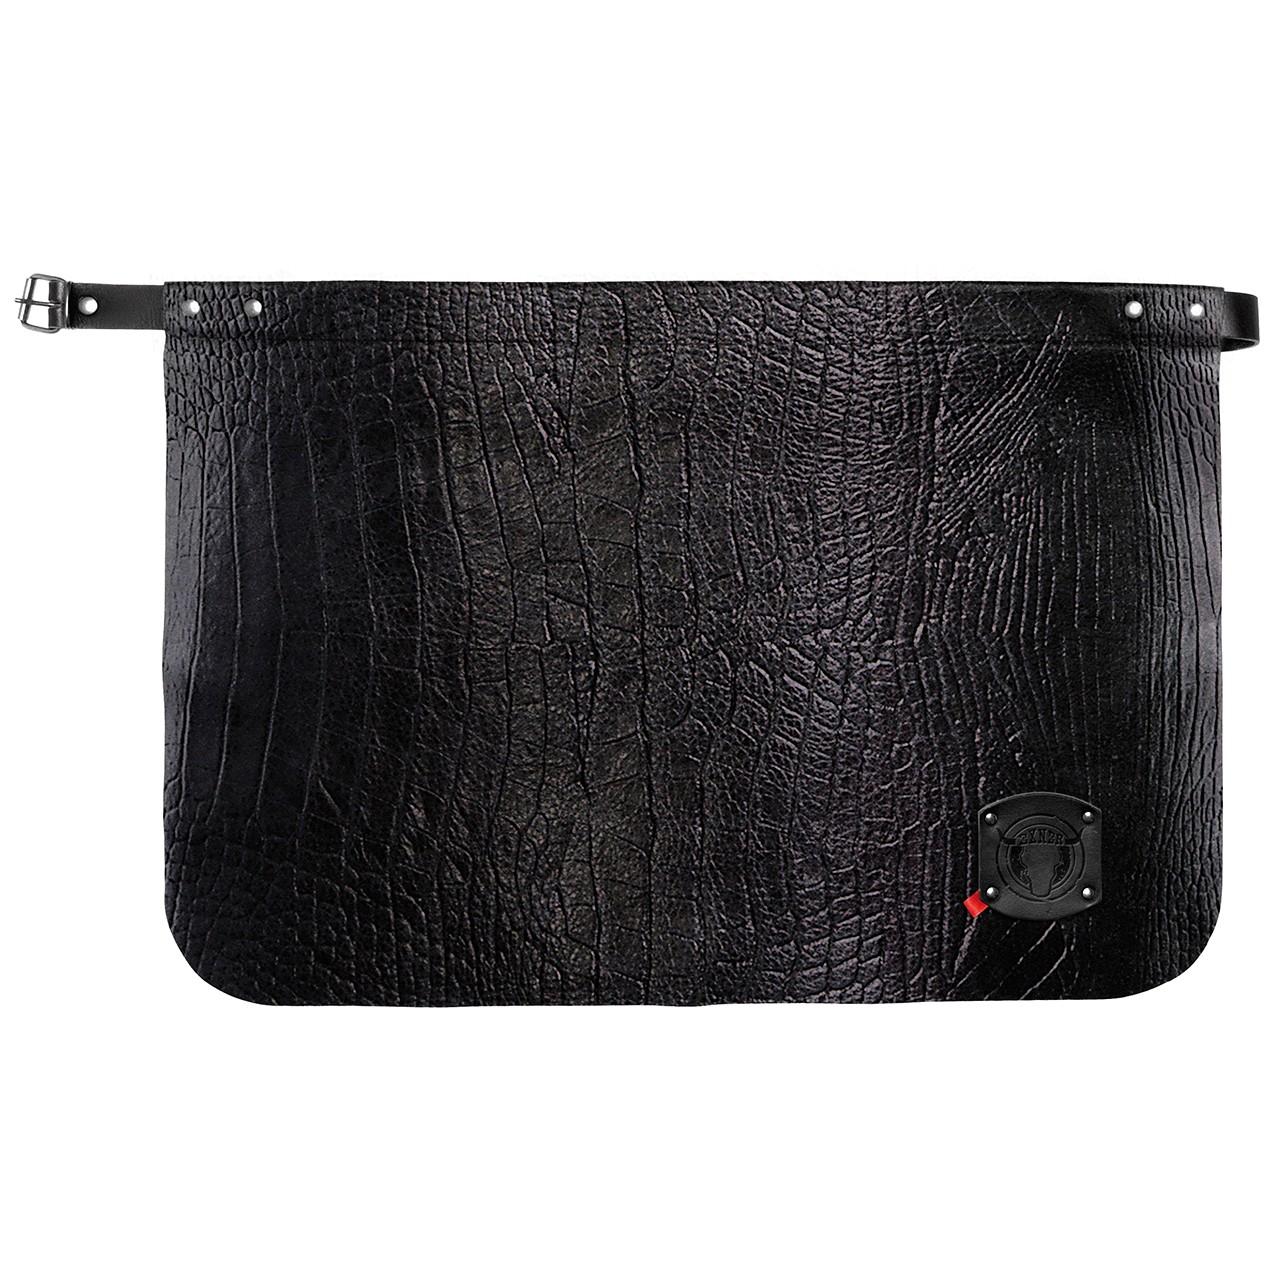 Leder Vorbinder Crocostyle Exner® | bedrucken, besticken, bedrucken lassen, besticken lassen, mit Logo |